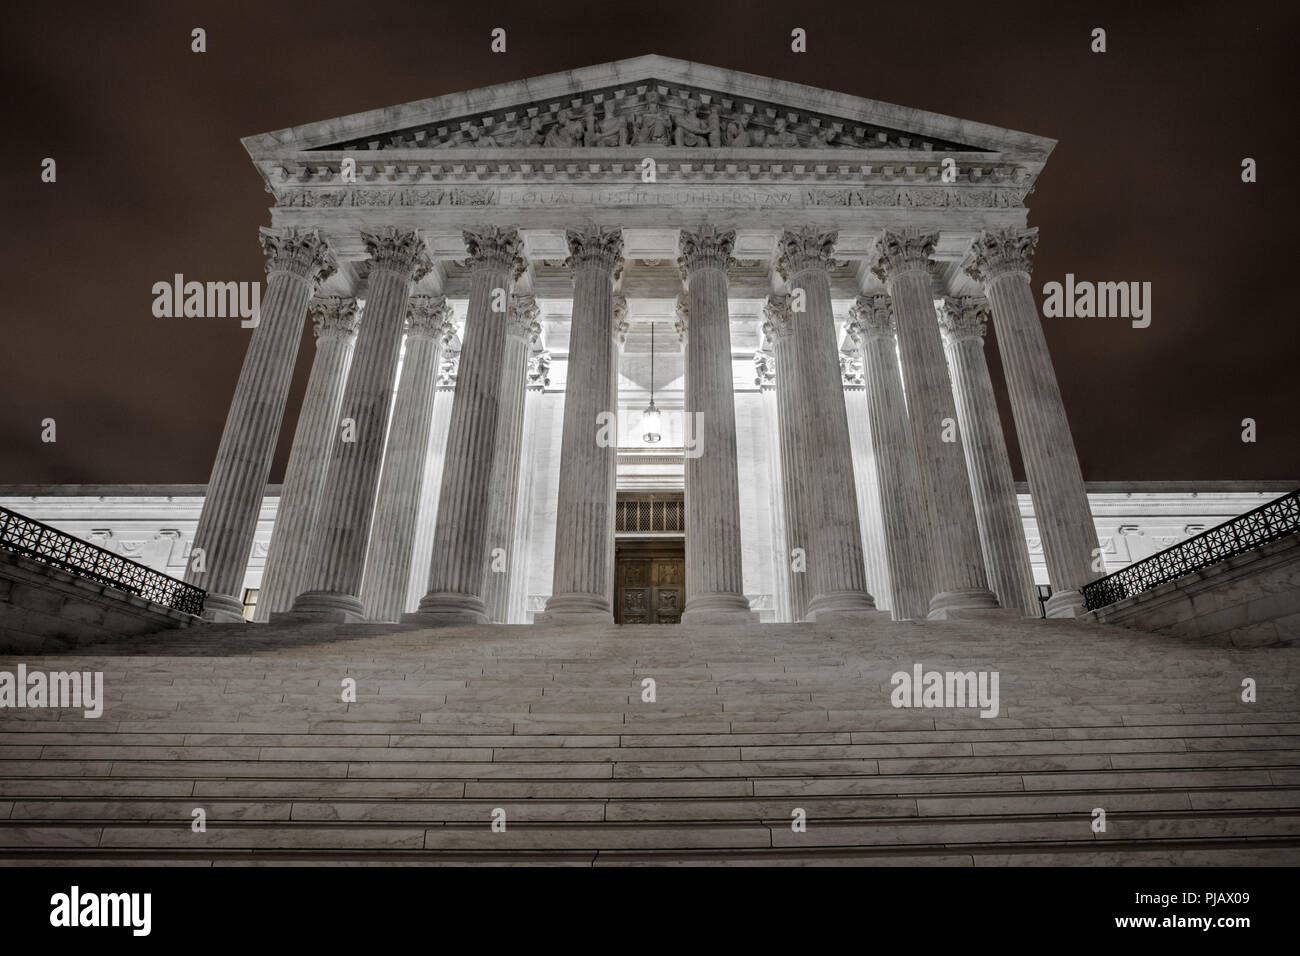 U.S. Supreme Court, Washington D.C. - Stock Image